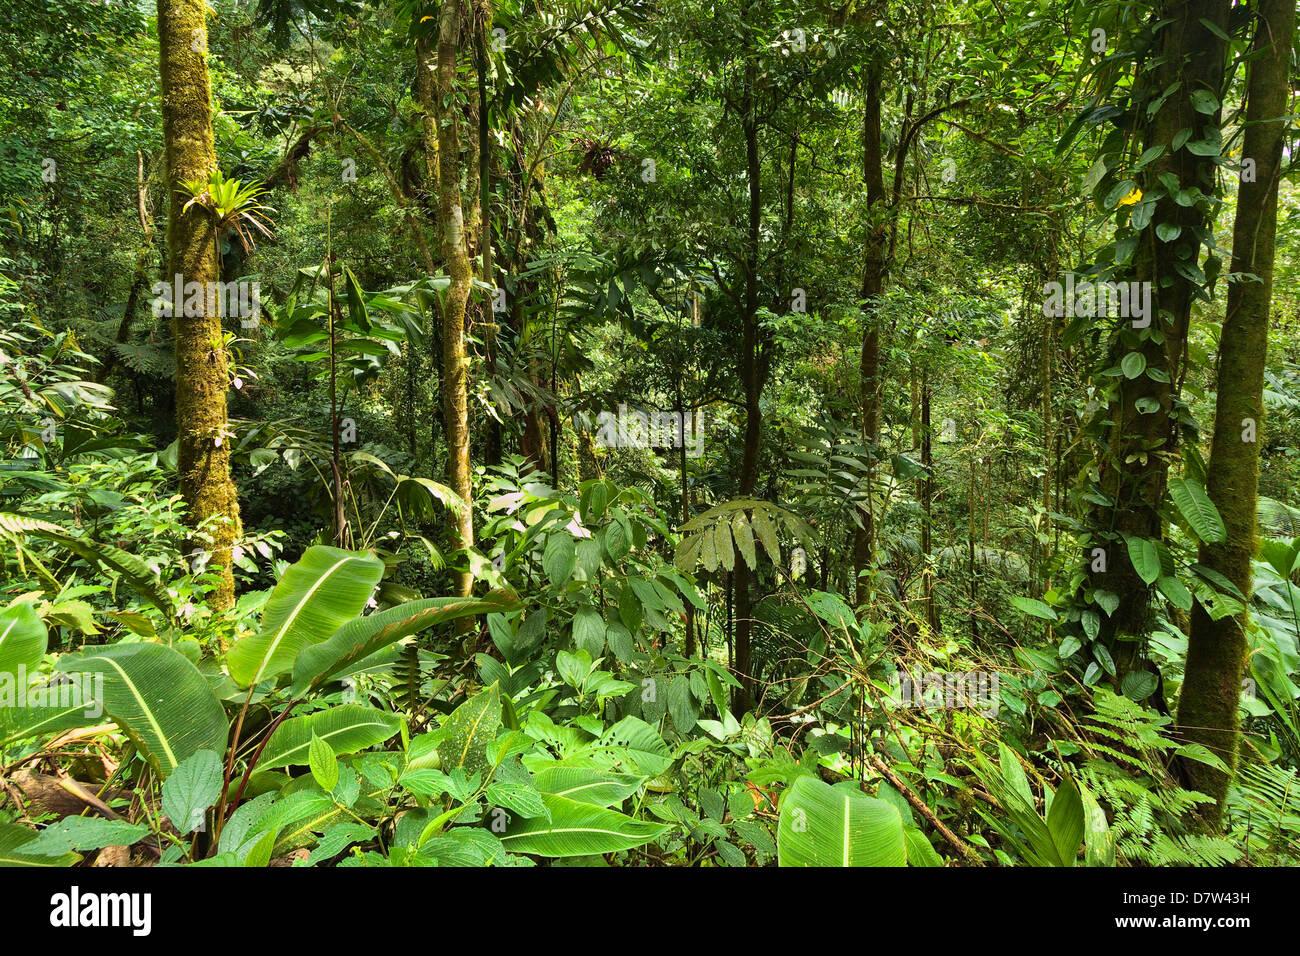 Dschungel am Arenal Hängebrücken wo Regenwald über Gehwege, La Fortuna, Provinz Alajuela, Costa Rica Stockbild